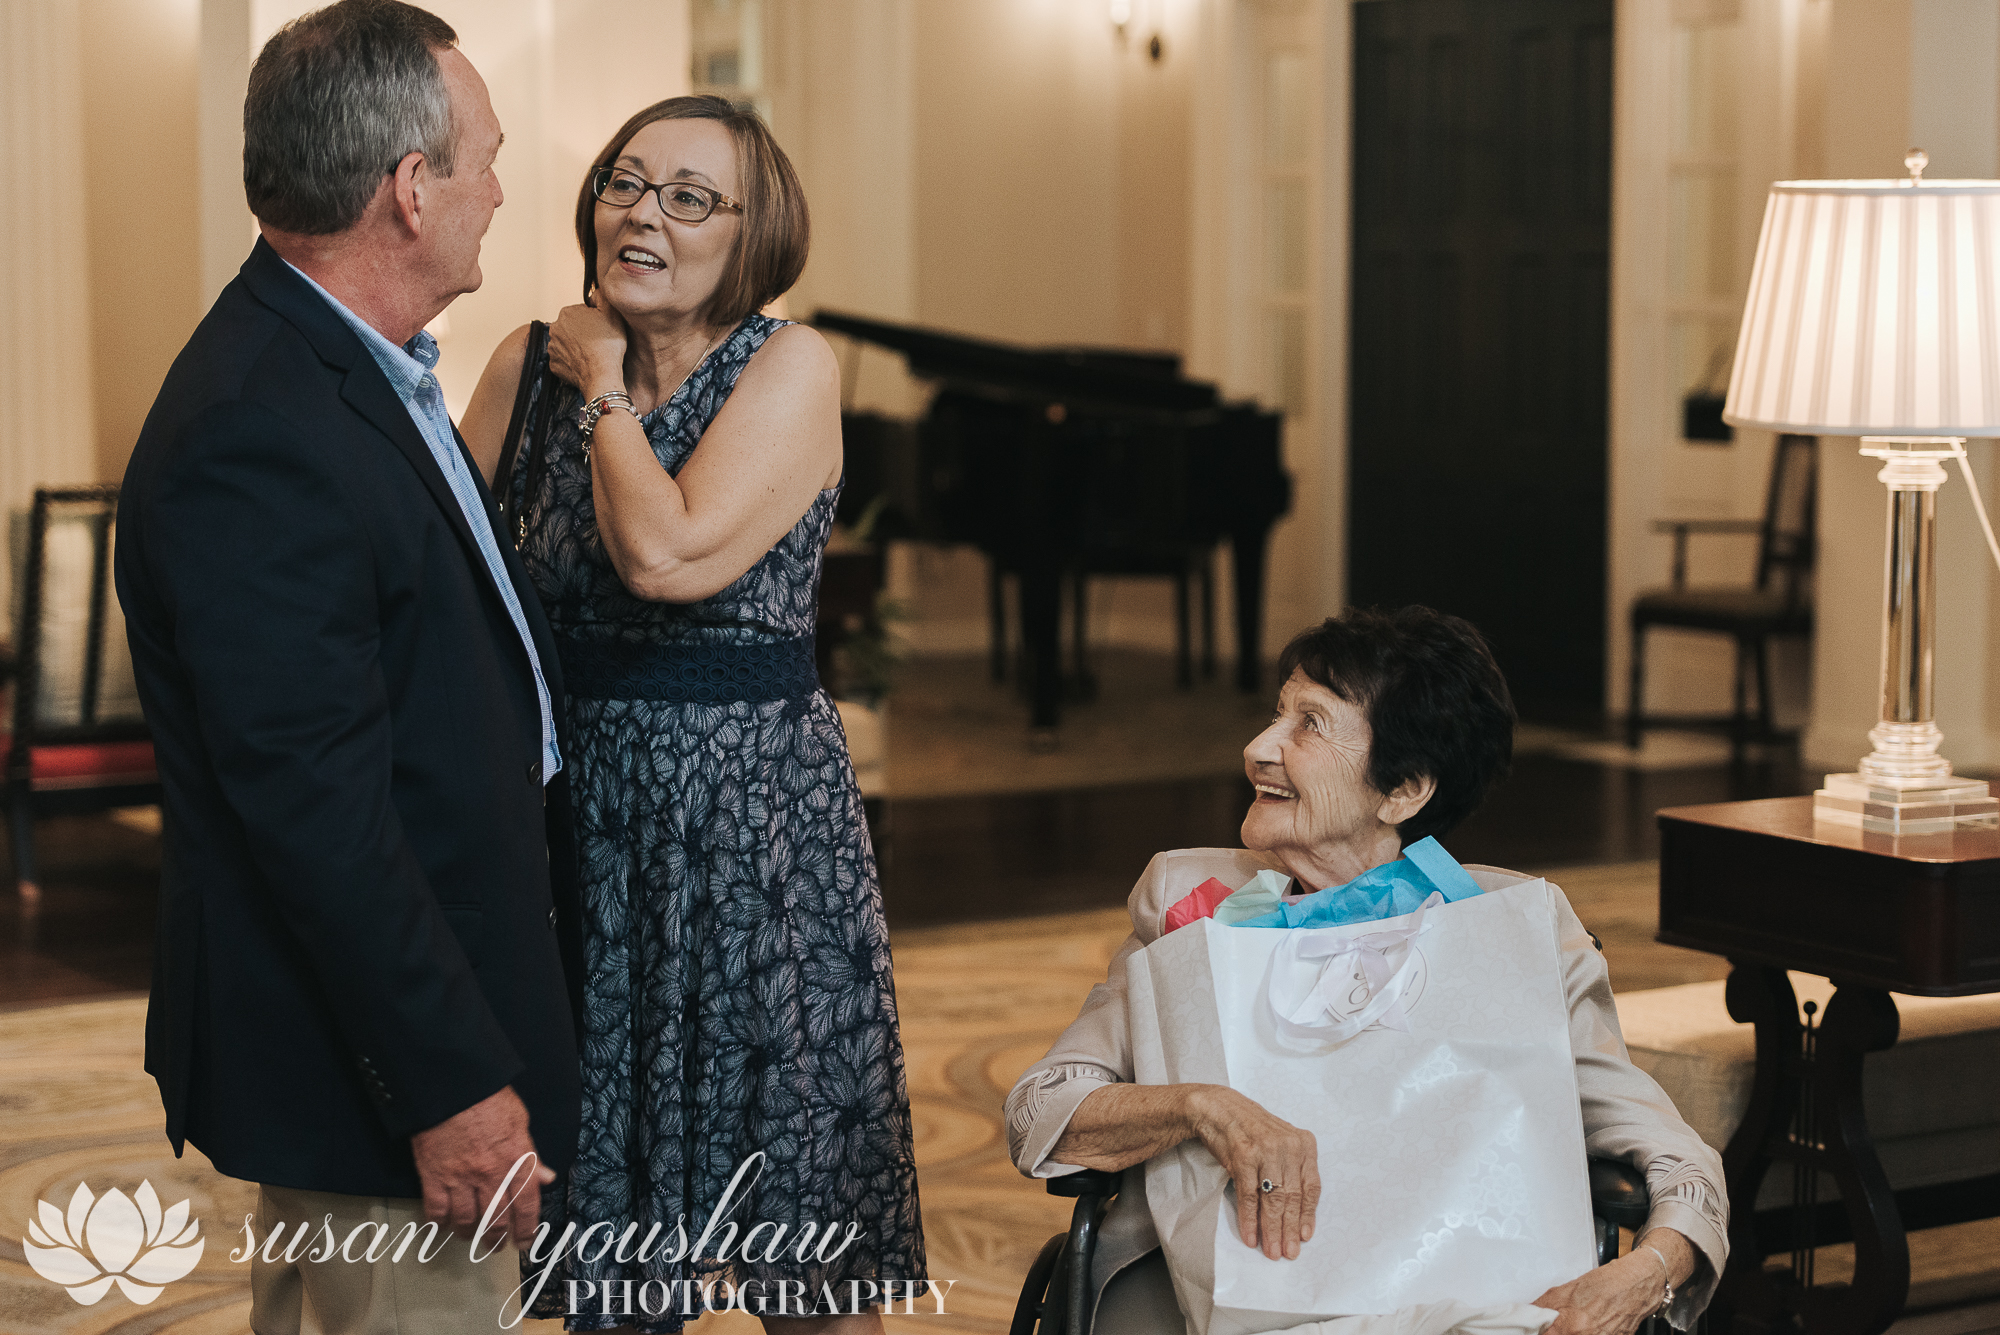 BLOG Carolyn Adams and Jim McCune 07-04-2018 SLY Photography-47.jpg